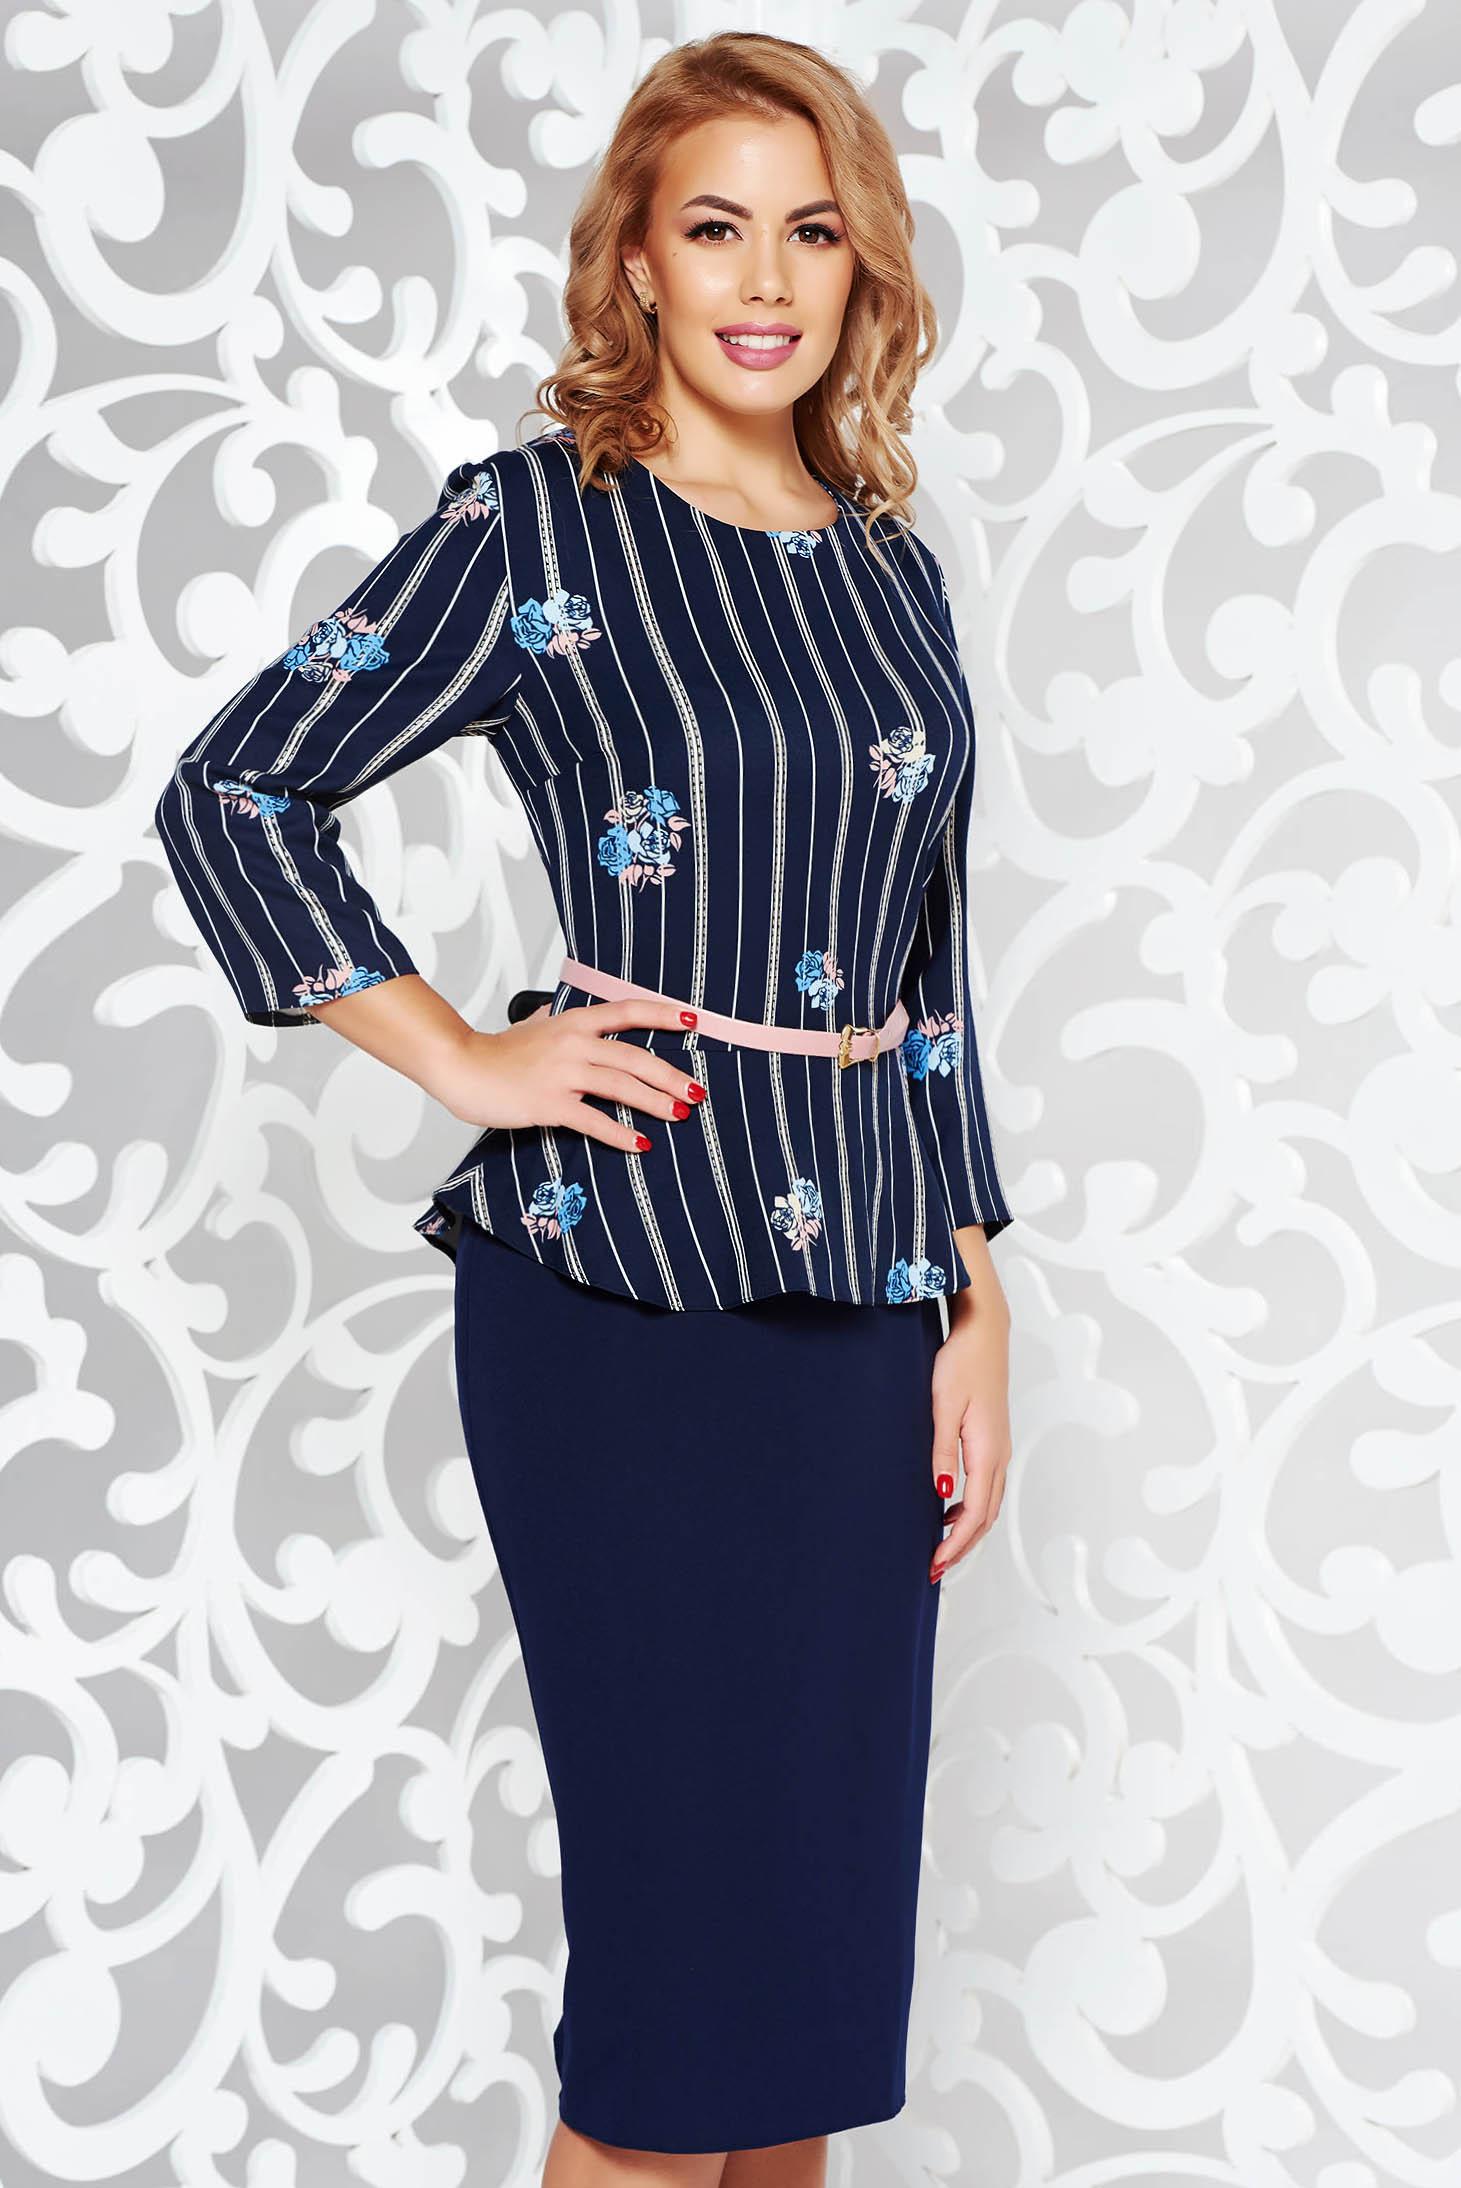 Rochie albastra-inchis office tip creion din stofa usor elastica cu peplum cu accesoriu tip curea